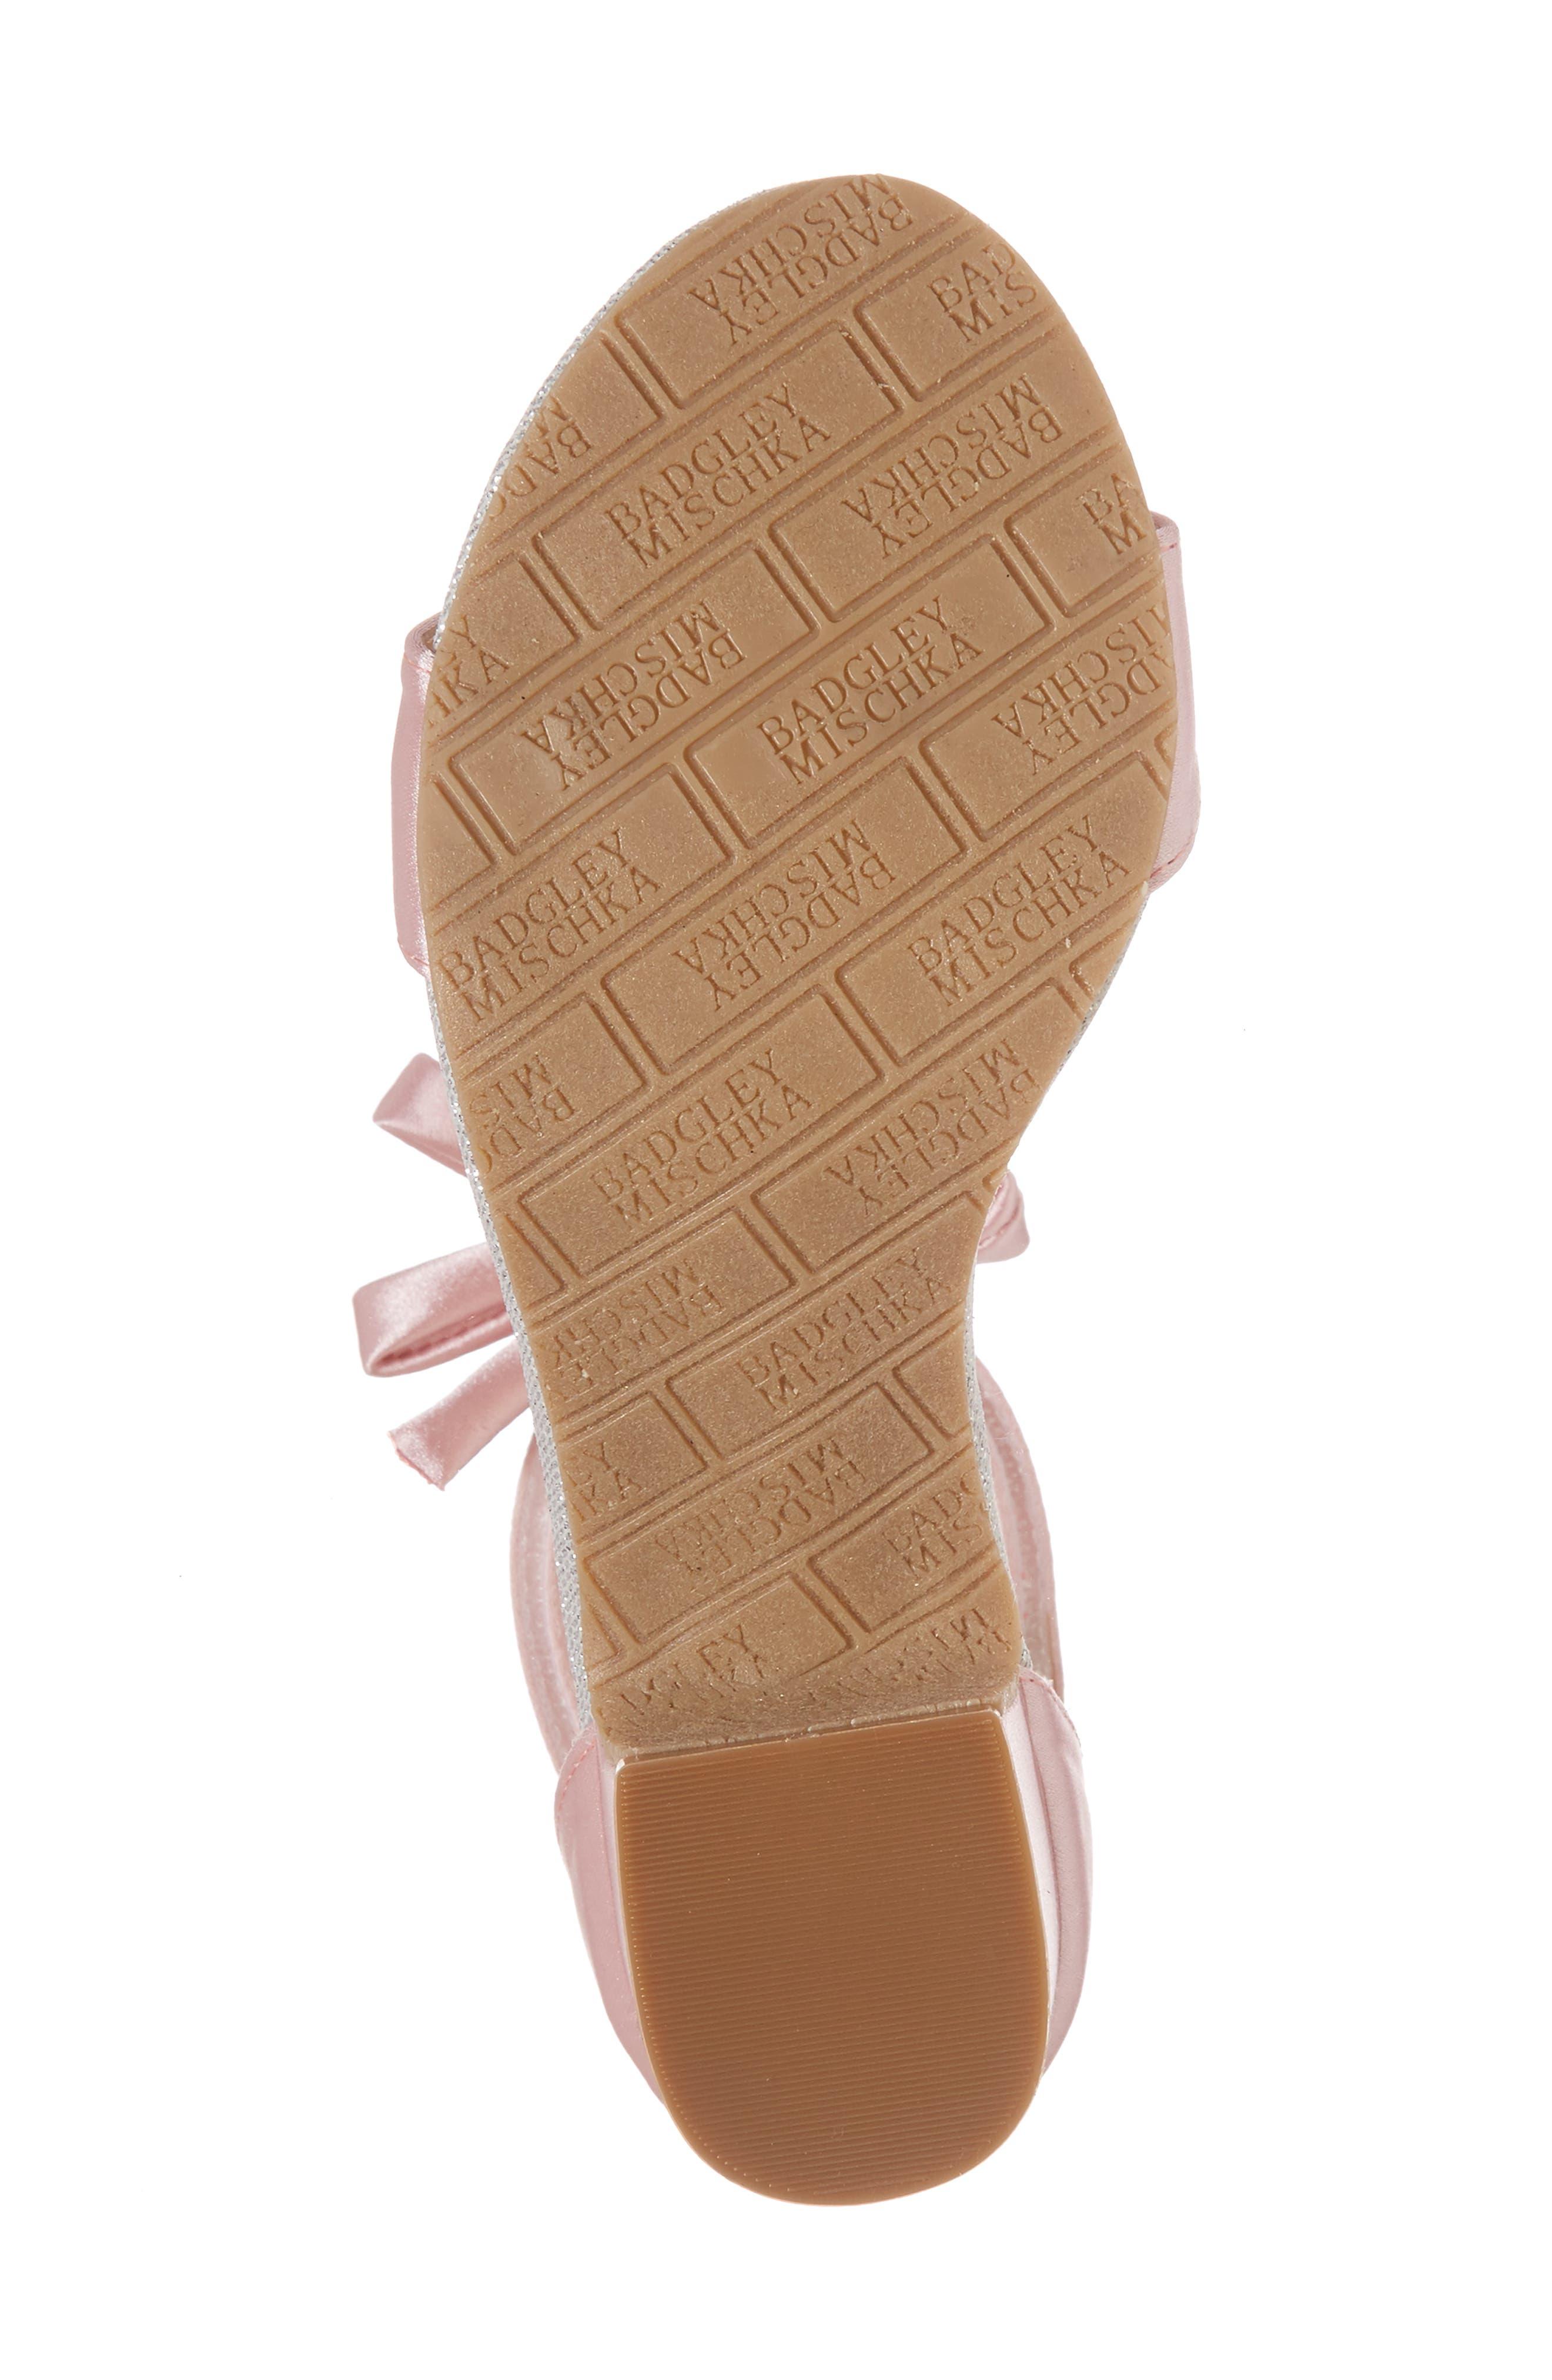 BADGLEY MISCHKA COLLECTION, Badgley Mischka Pernia Embellished Sandal, Alternate thumbnail 6, color, PINK/ SILVER